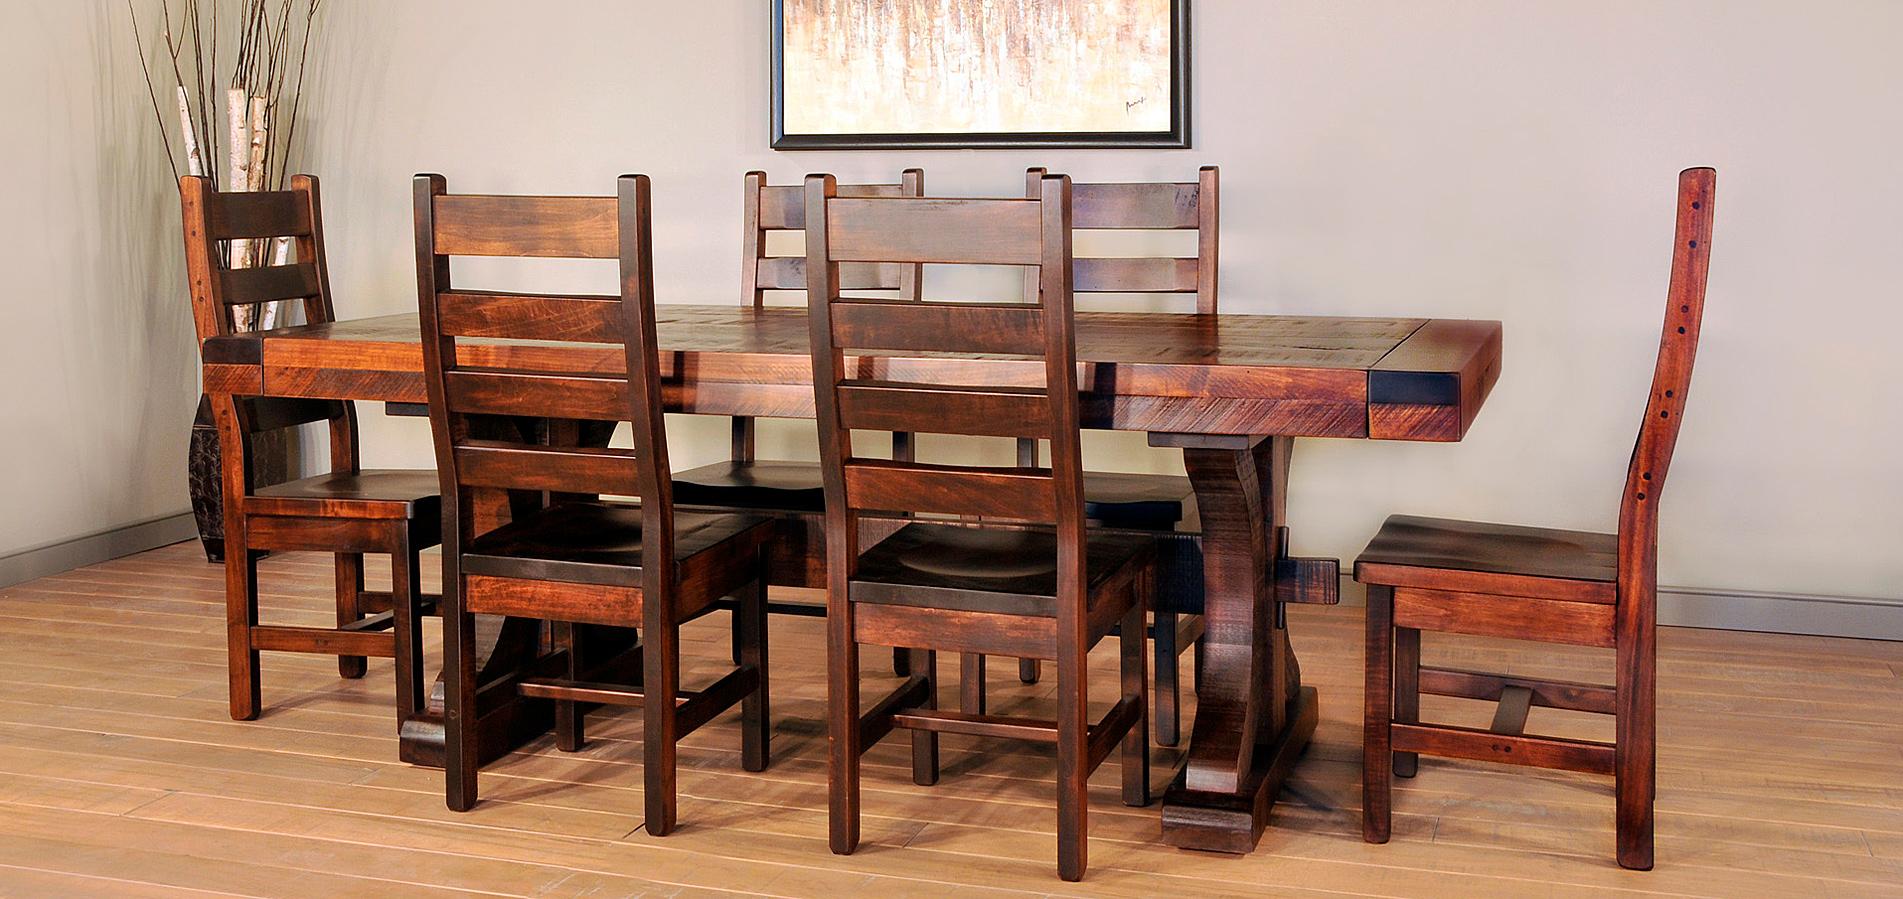 rustic-carisle-dining-1903-x-899.jpg